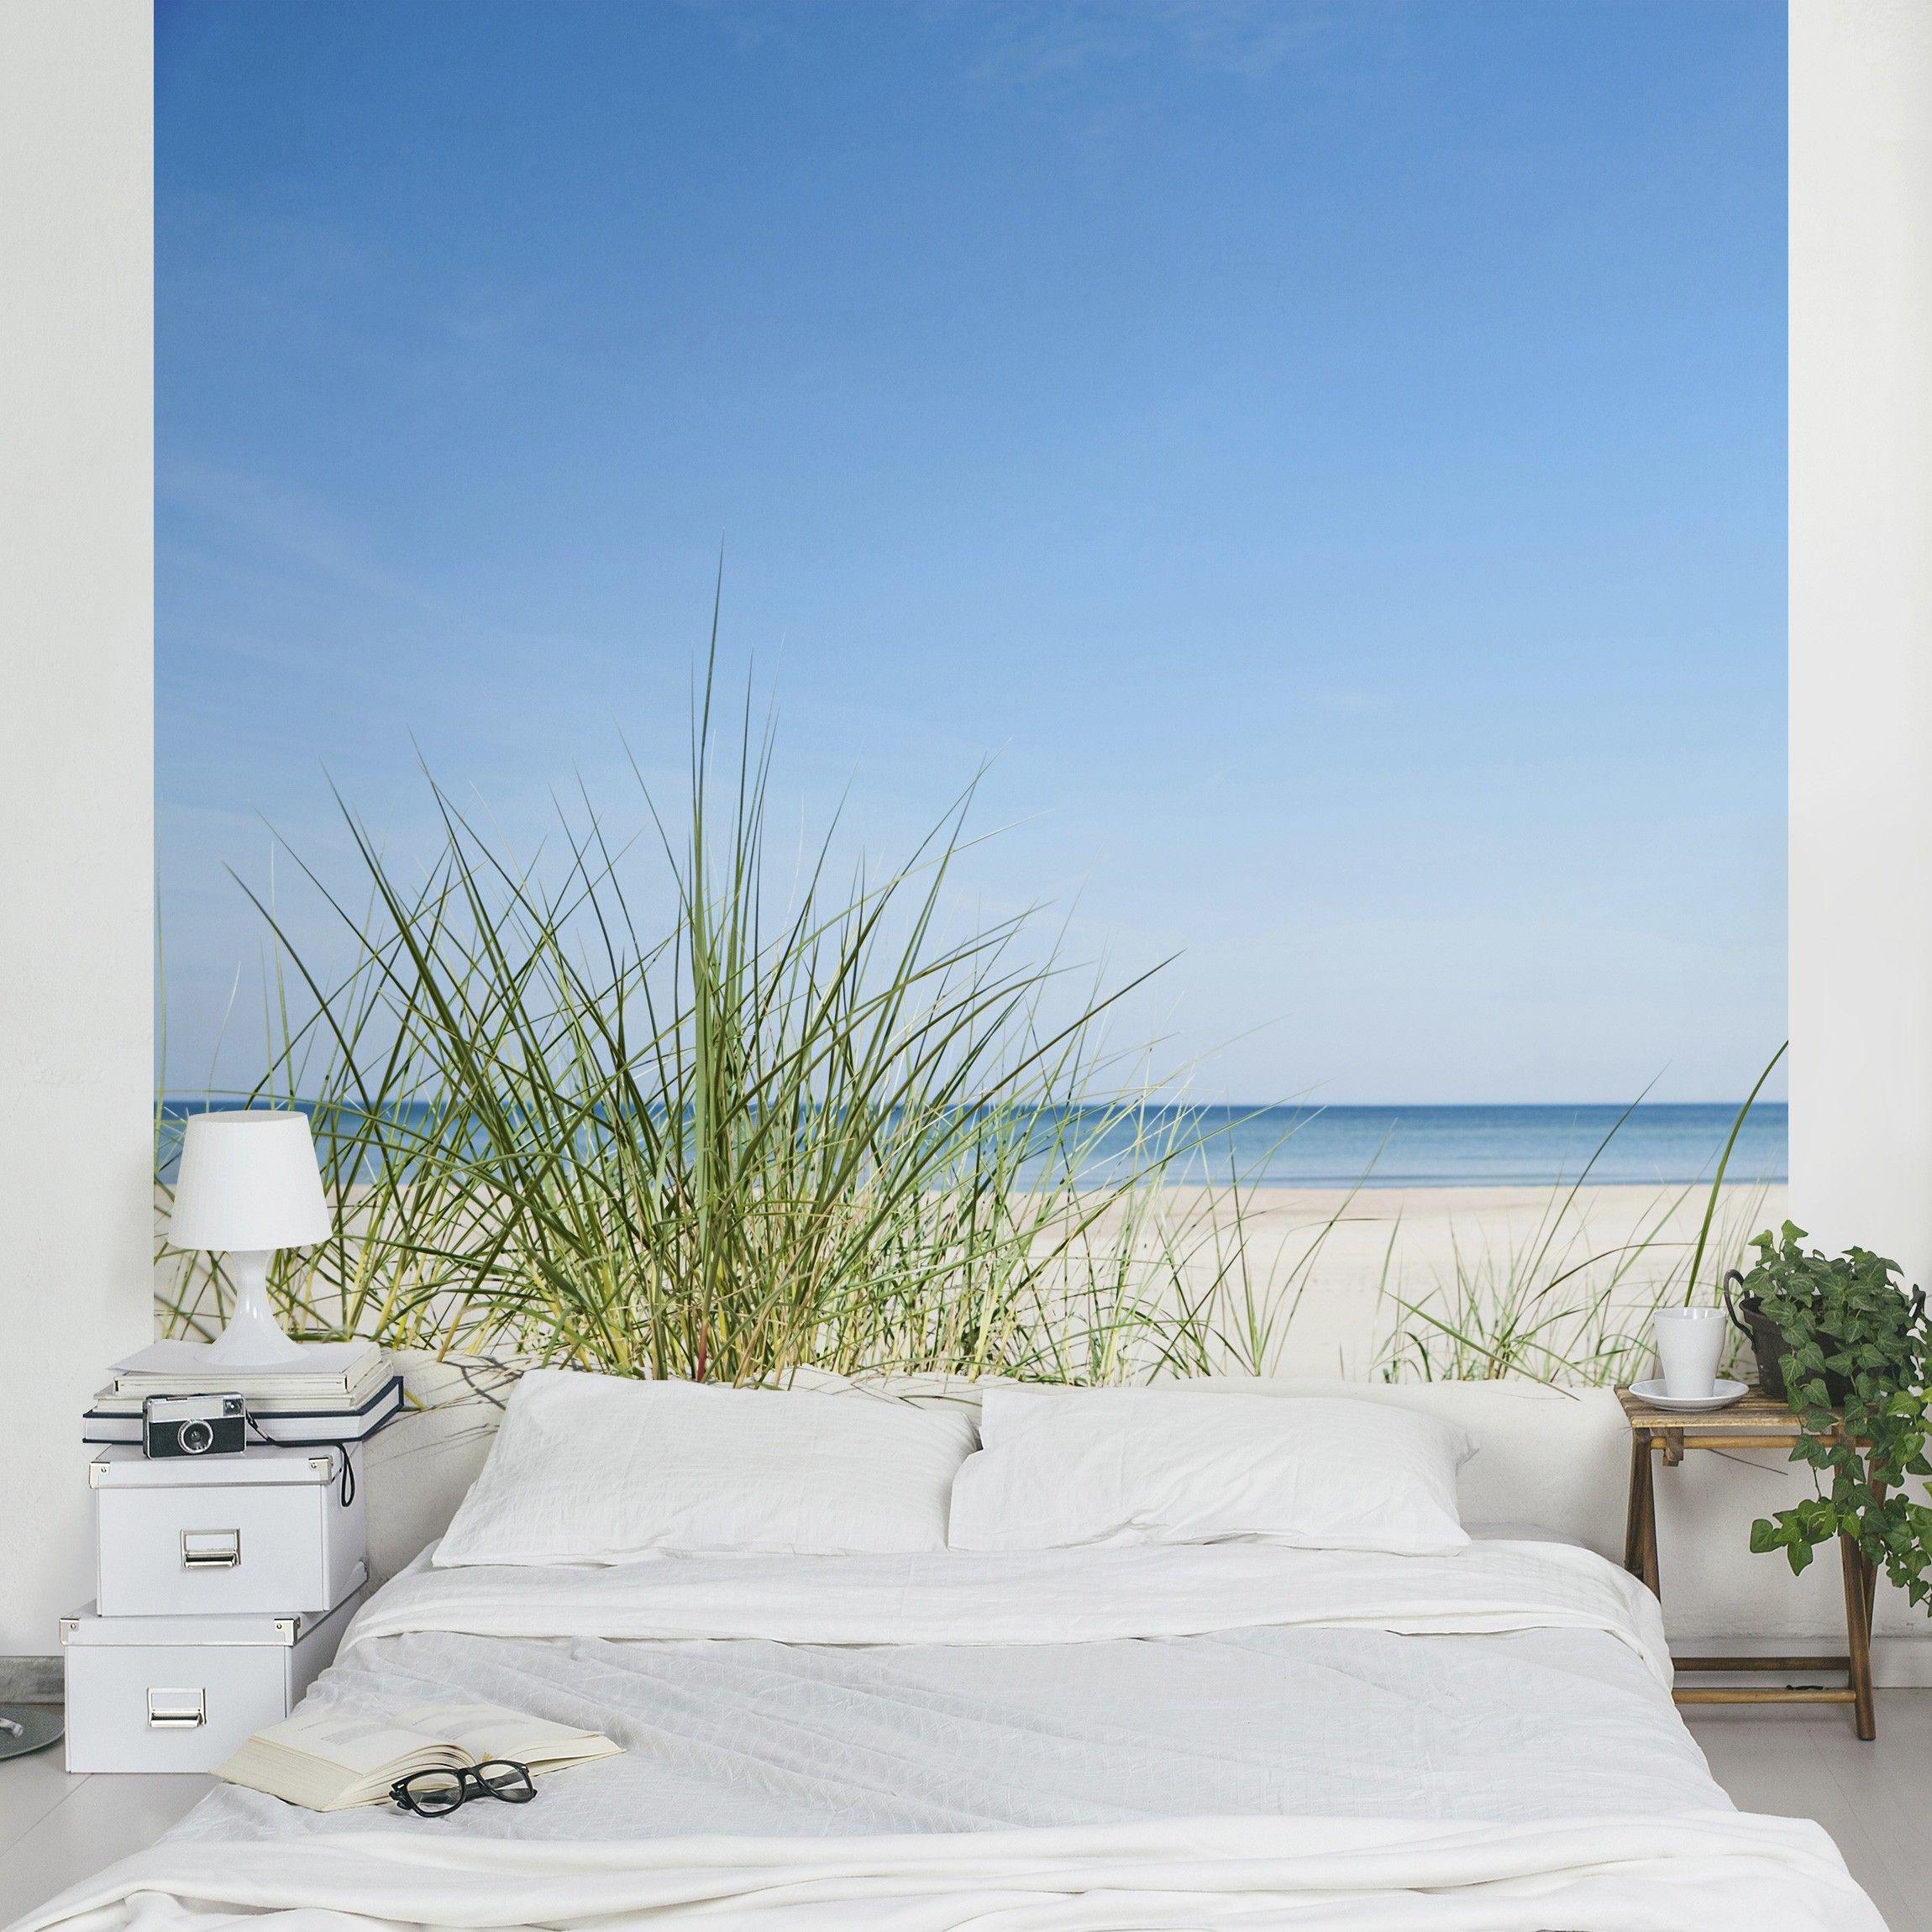 Fototapete Strand - Ostseeküste - Vliestapete Quadrat | Fototapety ...